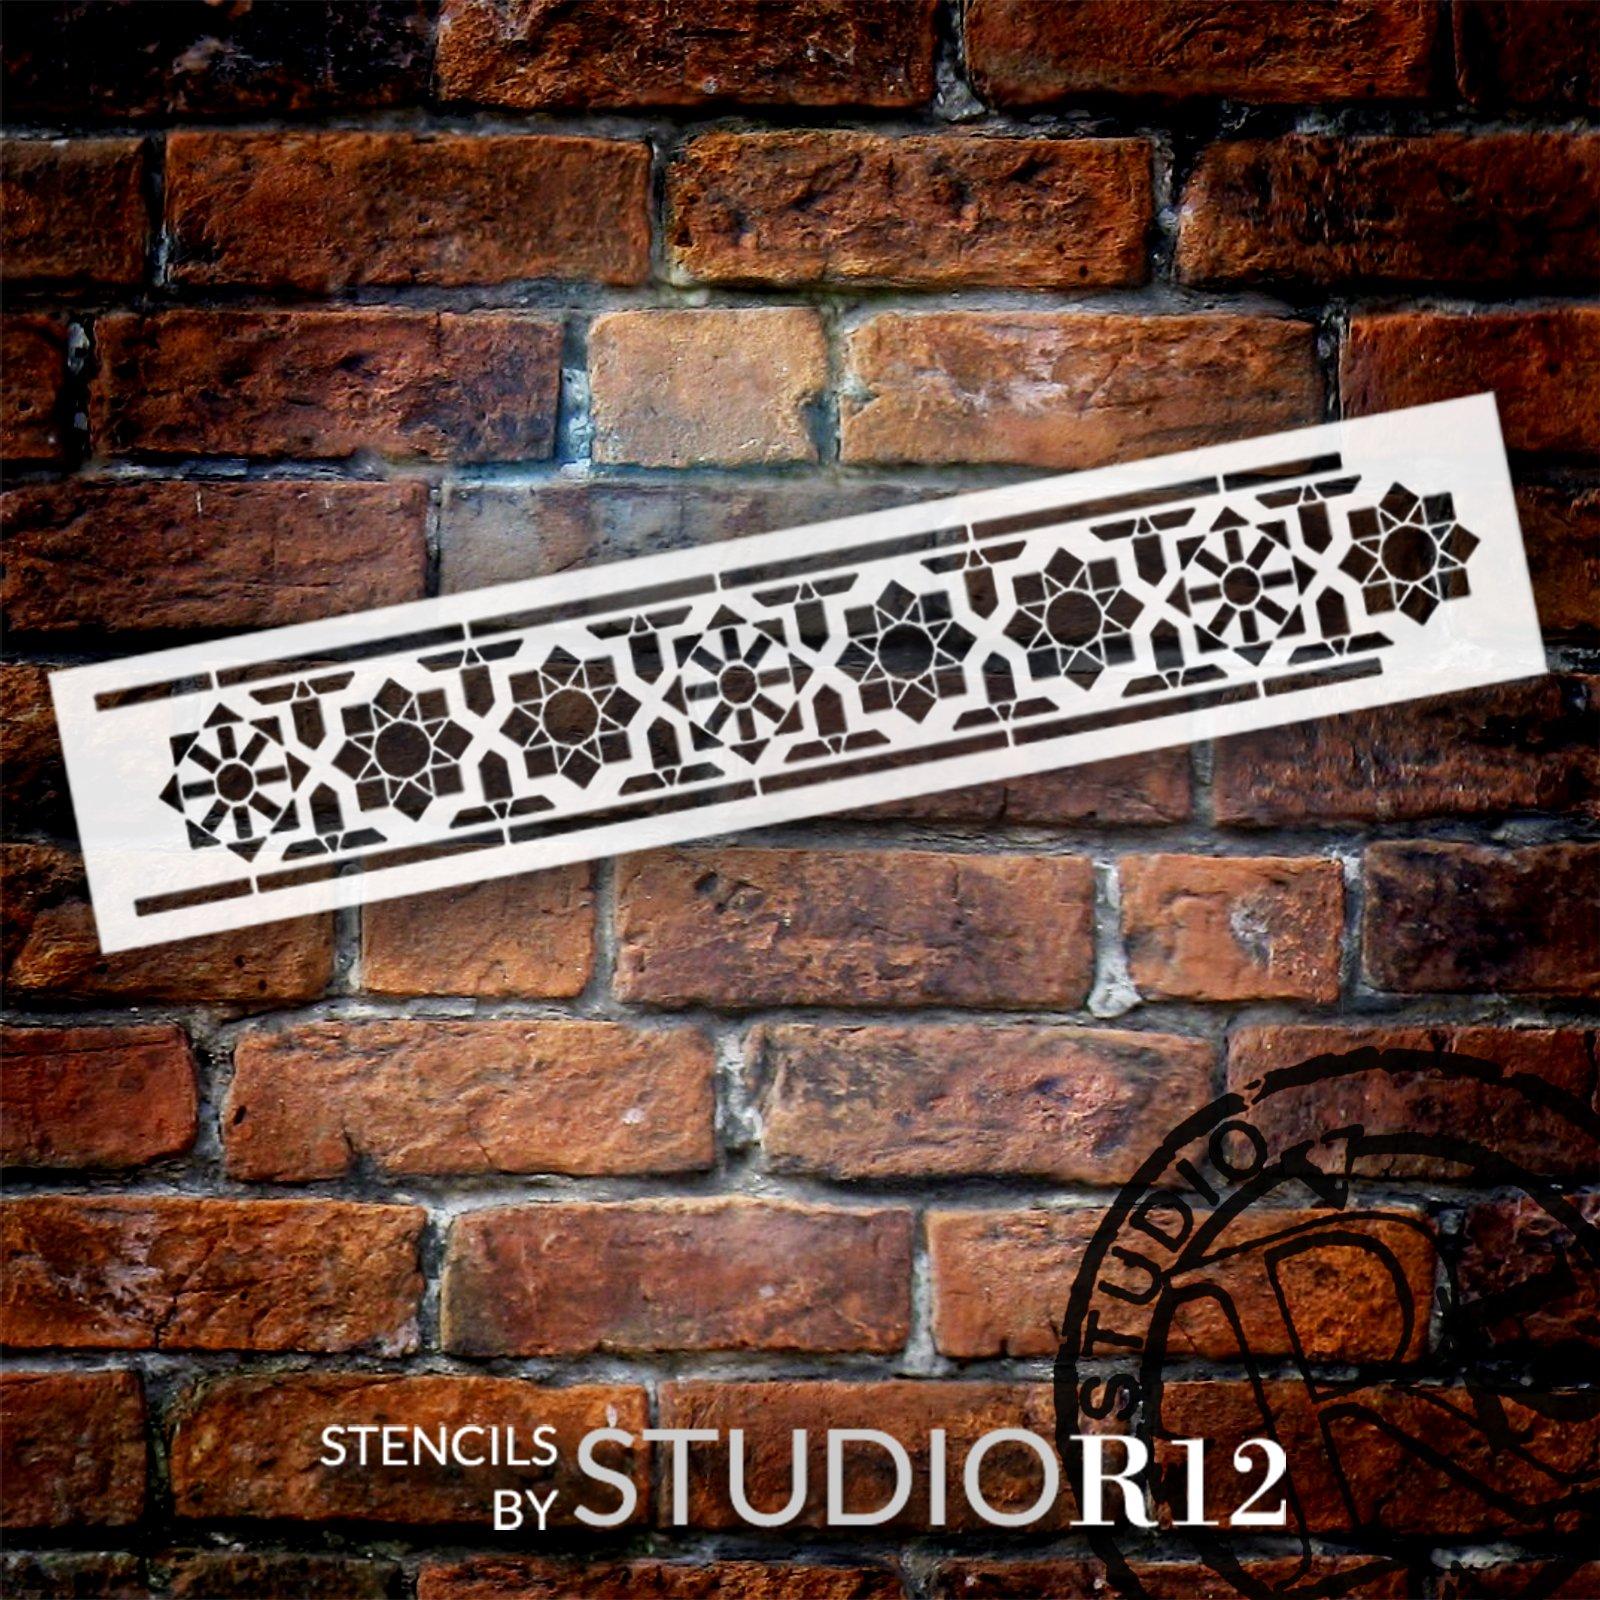 Arabian Mosaic Star Band Stencil by StudioR12   DIY Flower Sun Pattern Backsplash Home Decor   Craft & Paint Wood Sign Border   Select Size